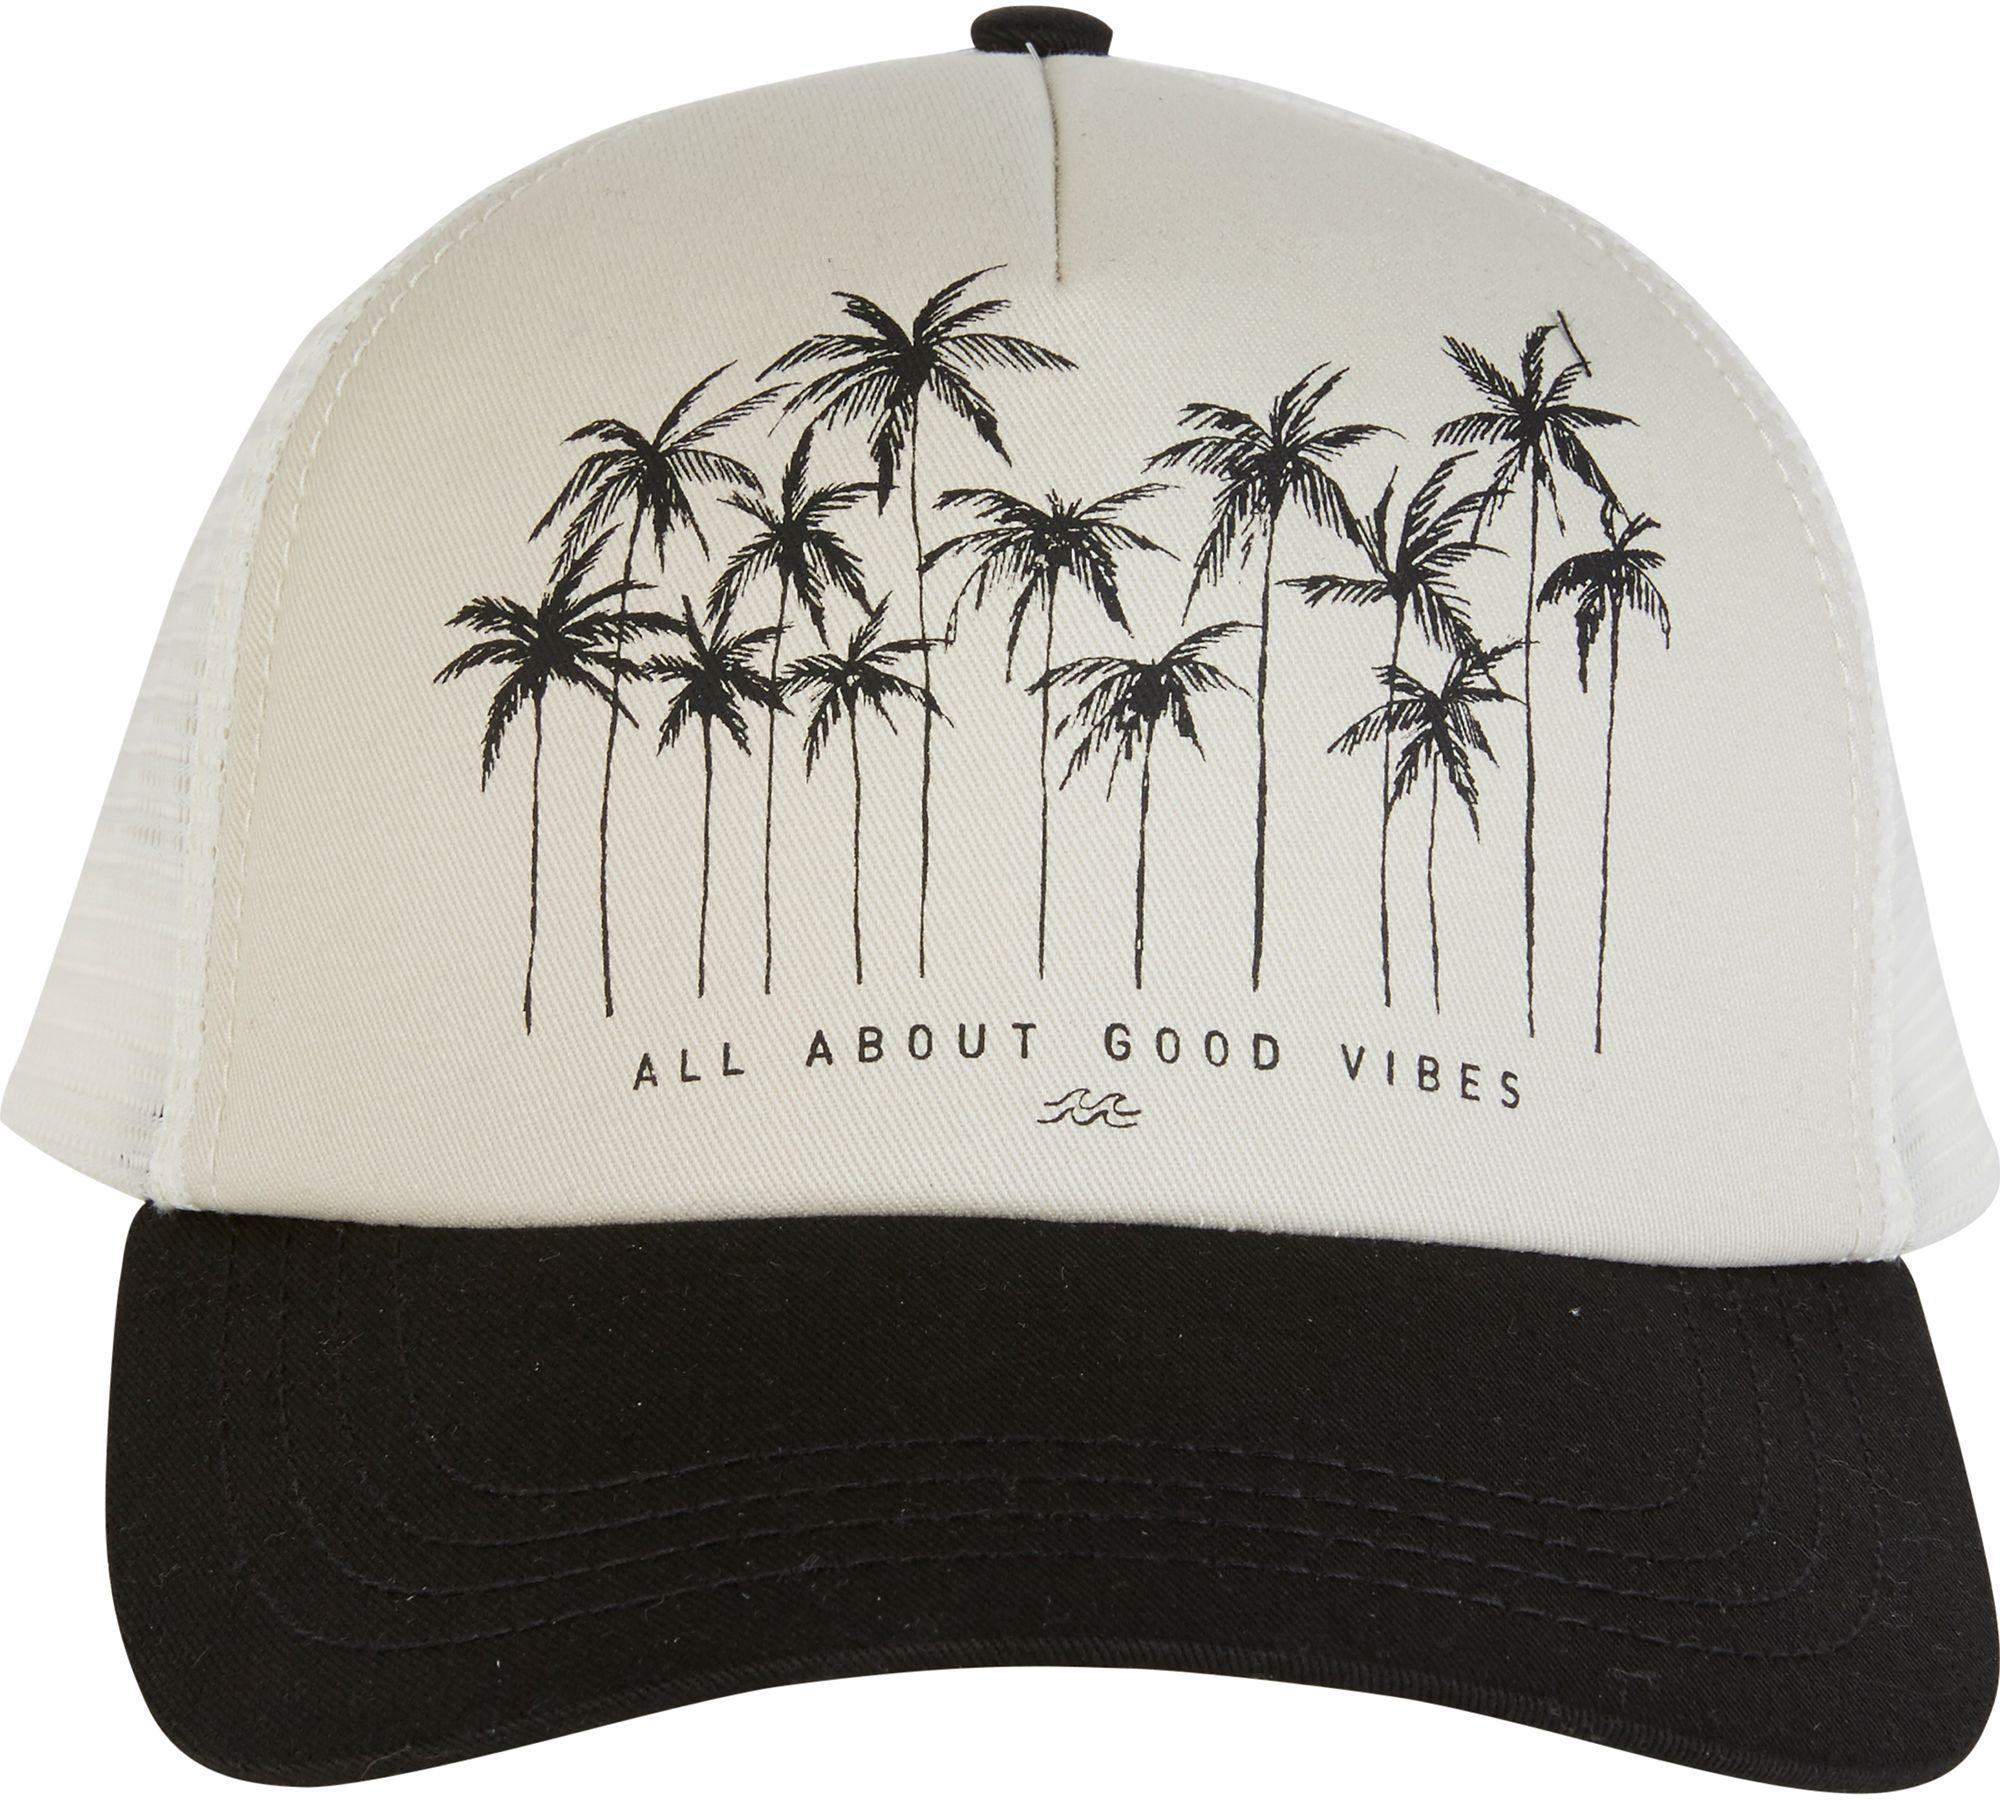 Lyst - Billabong Aloha Forever Trucker Hat - Save 44% 3cea1cd59386